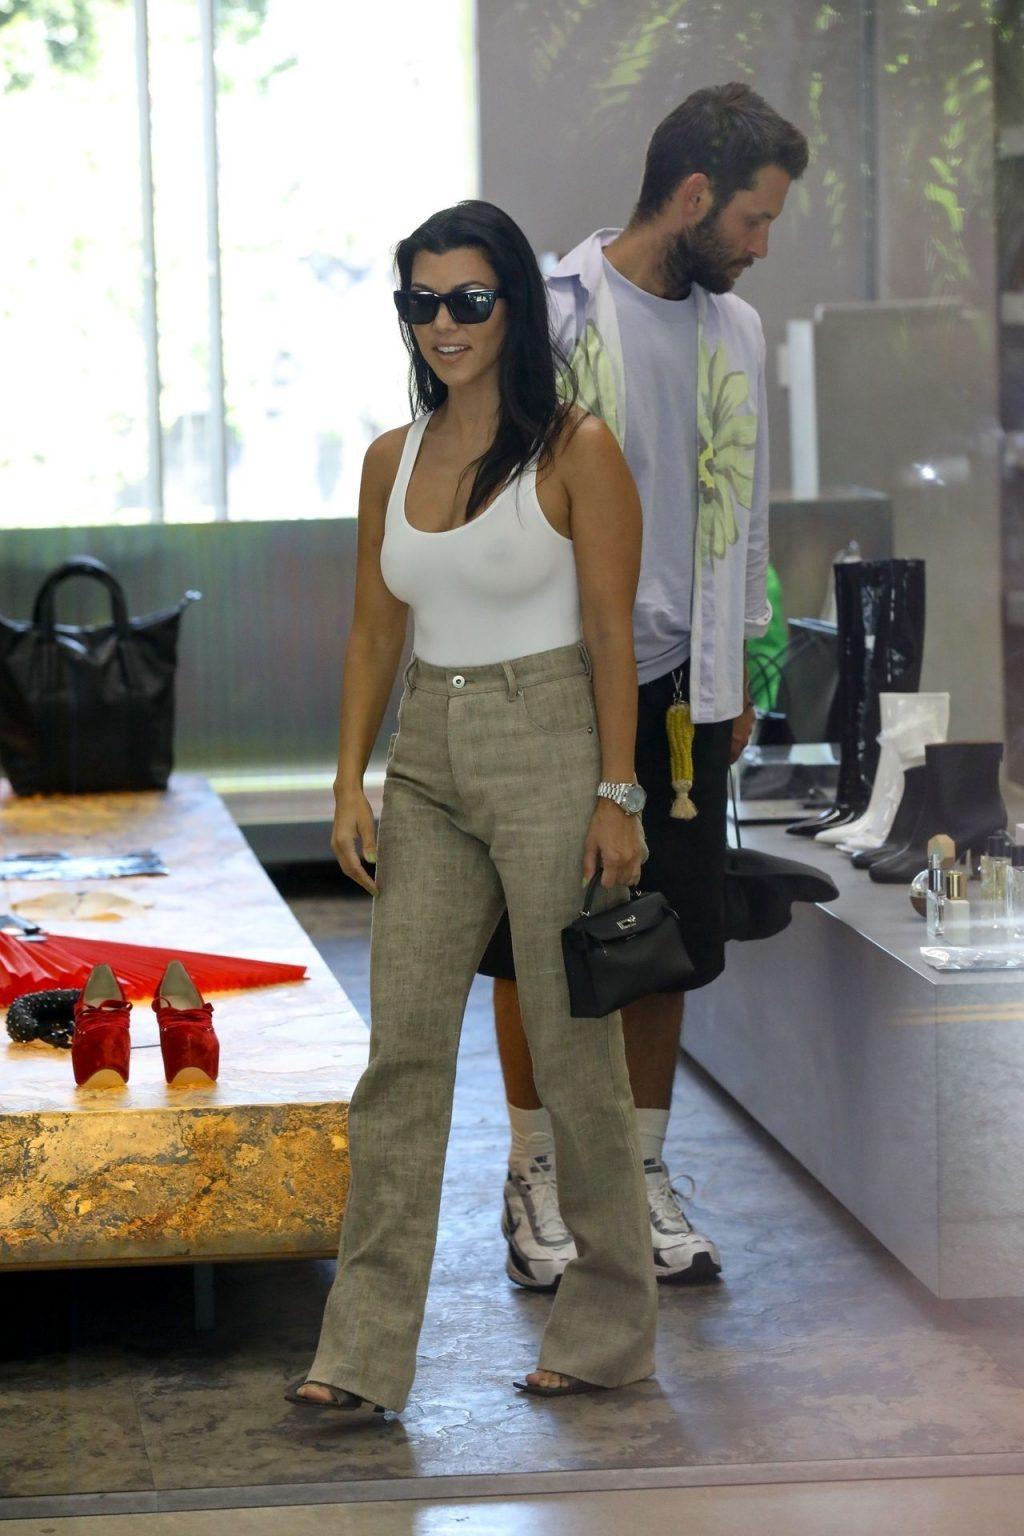 Kourtney Kardashian See Through Thefappeningblog Com 140 102